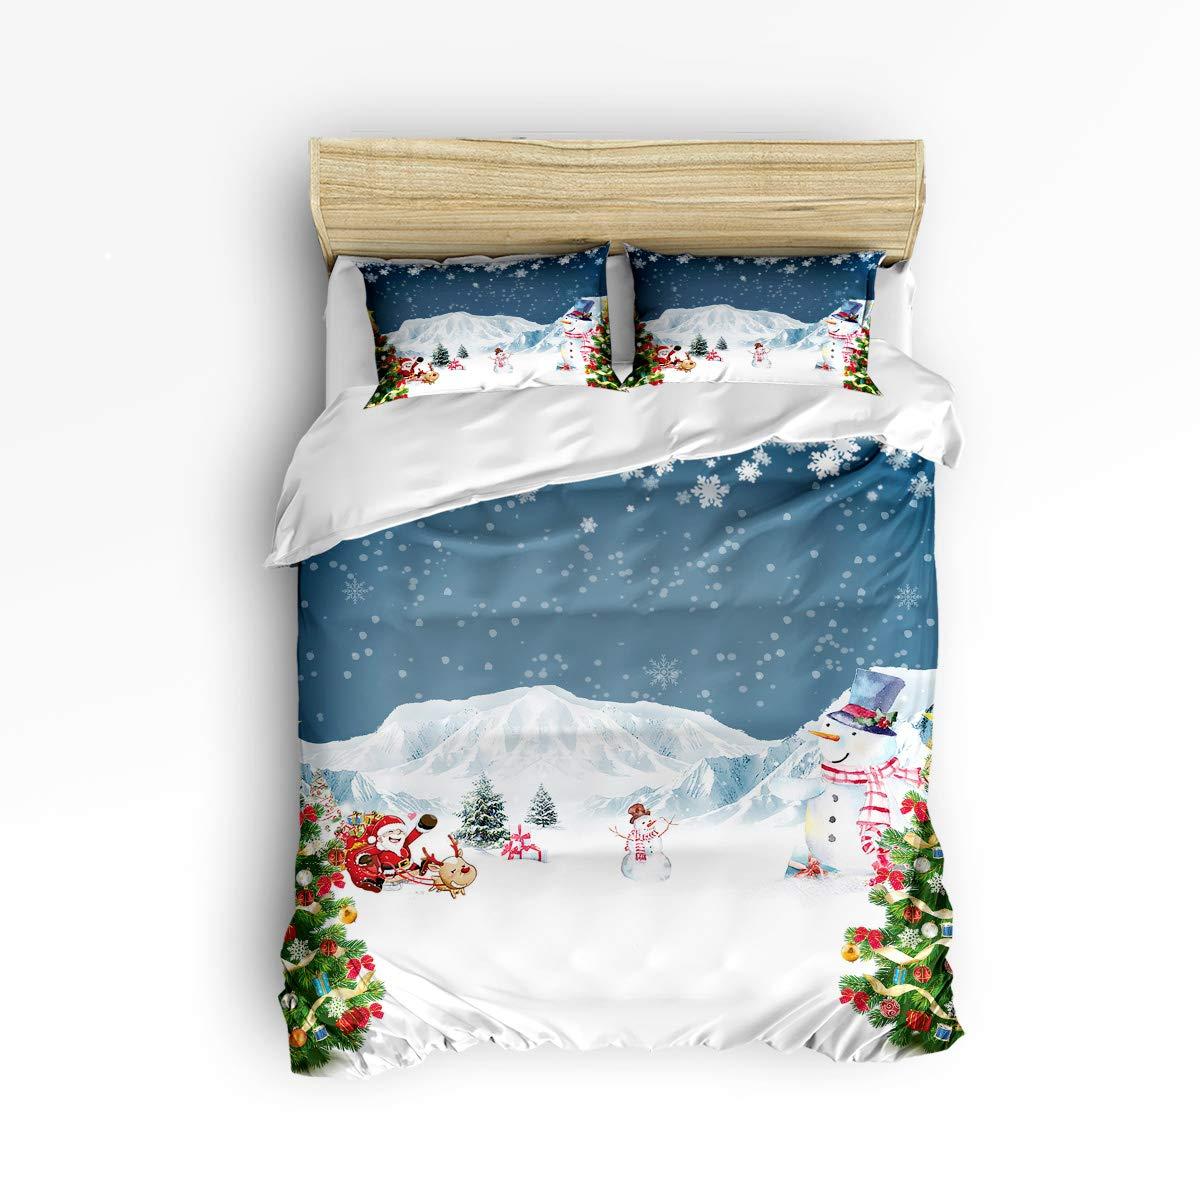 NewThangKa 3ピース寝具セット – ソフトダウン掛け布団キルト寝具カバー1枚 お揃いの枕カバー2枚 ファスナー開閉 クリスマスシンボルクリスマスパターン寝具布団カバーセット Twin Size WSJ-181122-3pcsets-SWTQ00308SJSANTK B07L85Y271 Snowman20ntk4390 Twin Size